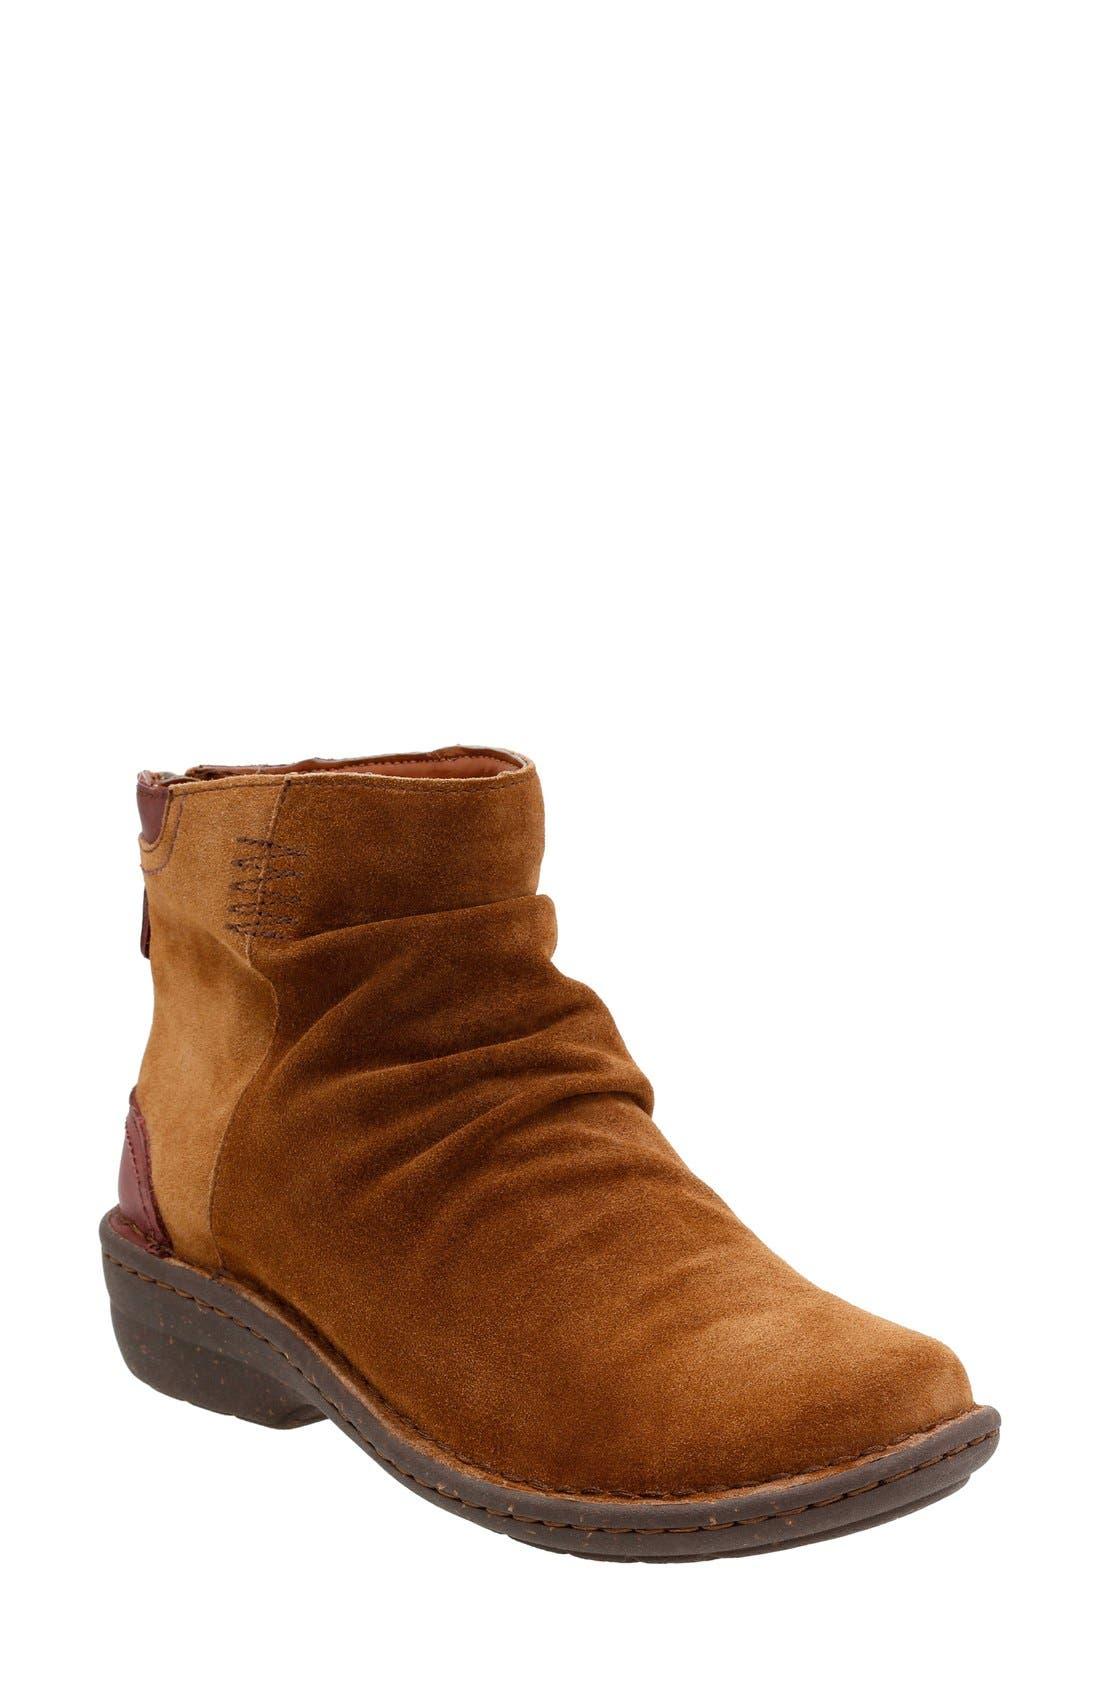 'Avington Swan' Ankle Boot,                         Main,                         color, Tan Suede